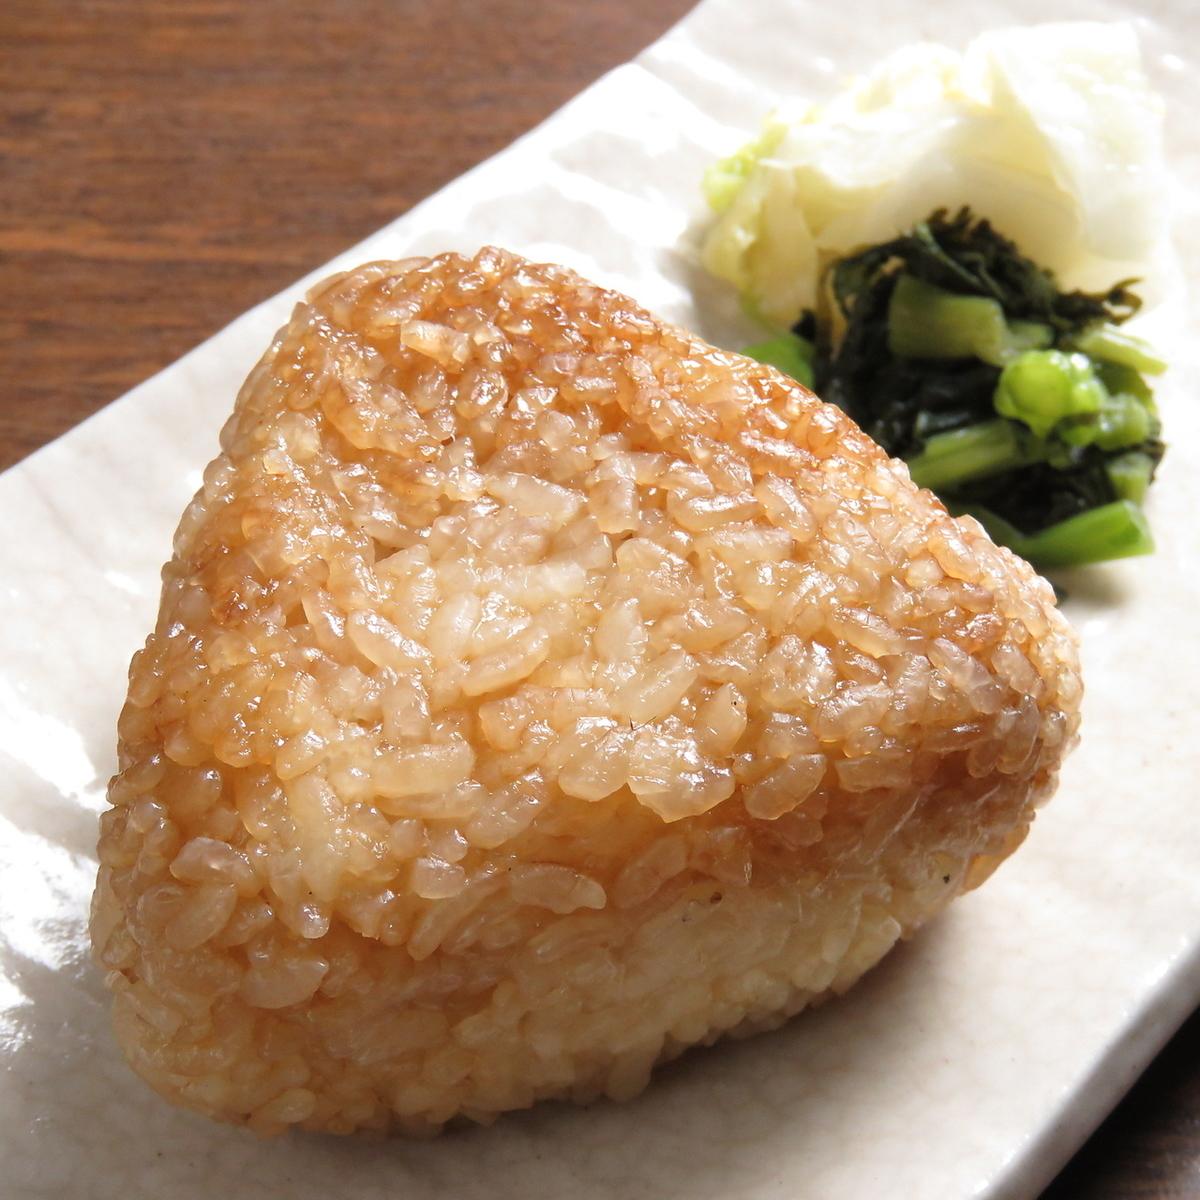 Grilled rice balls 1 large